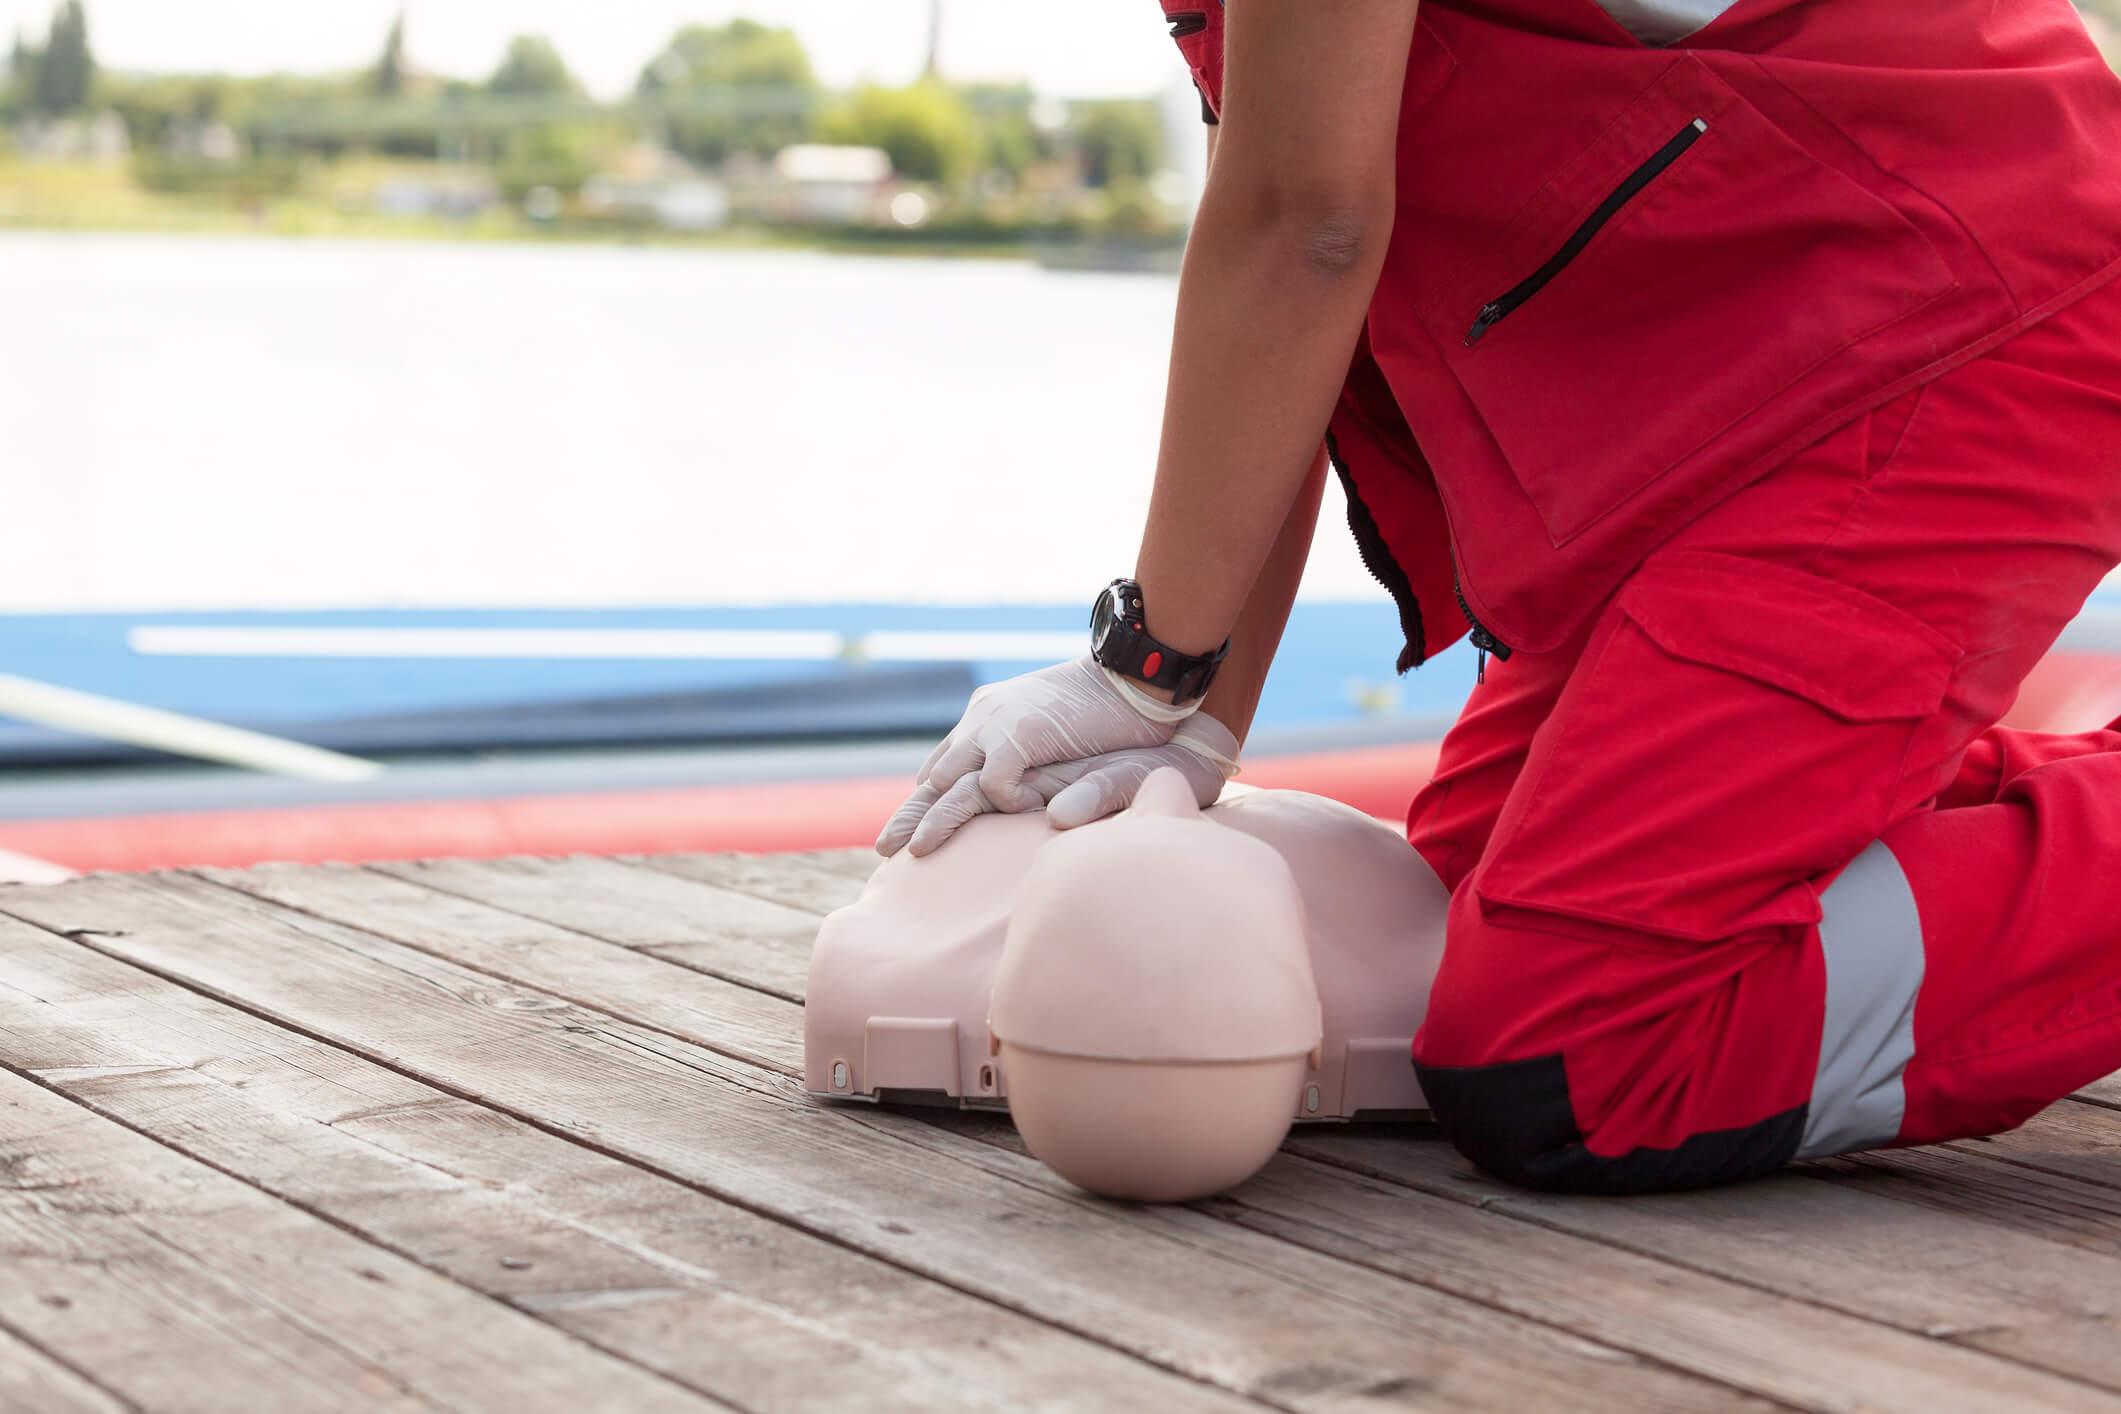 This Month in Emergency Preparedness News: Preparing for Summer Drowning Emergencies